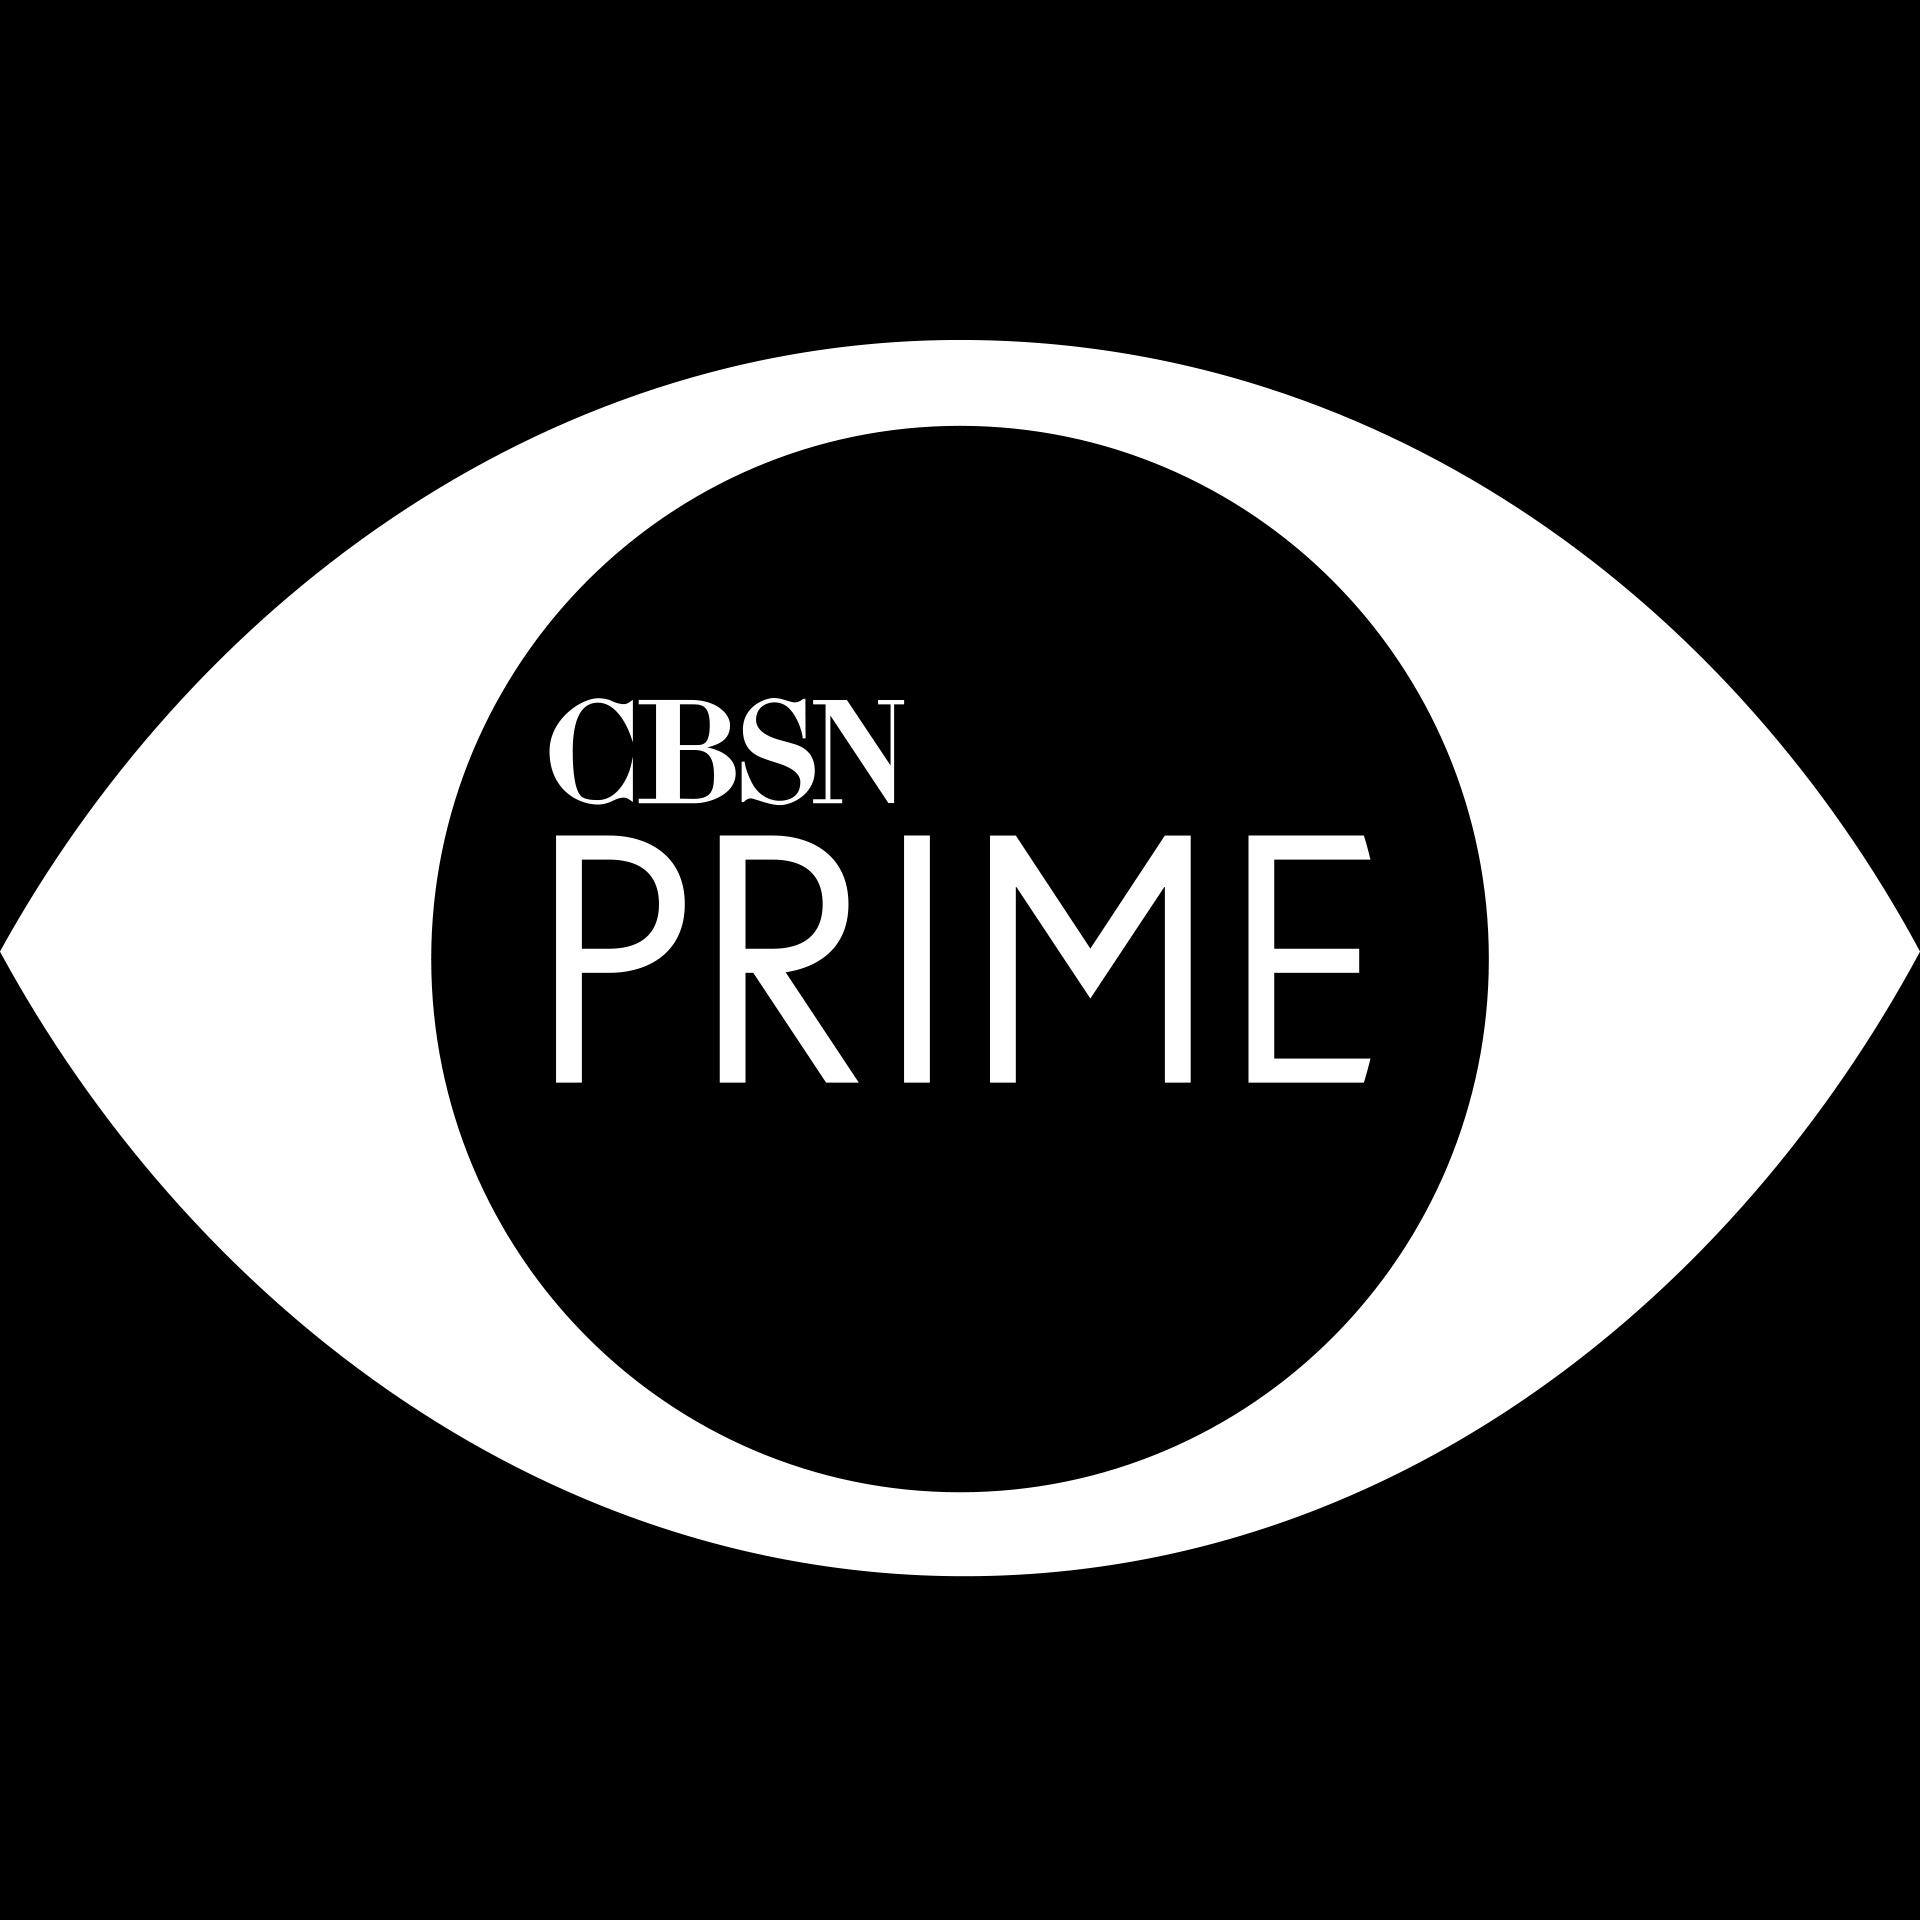 CBSNPRIME-TreatmentA-WordmarkInverted.jpg